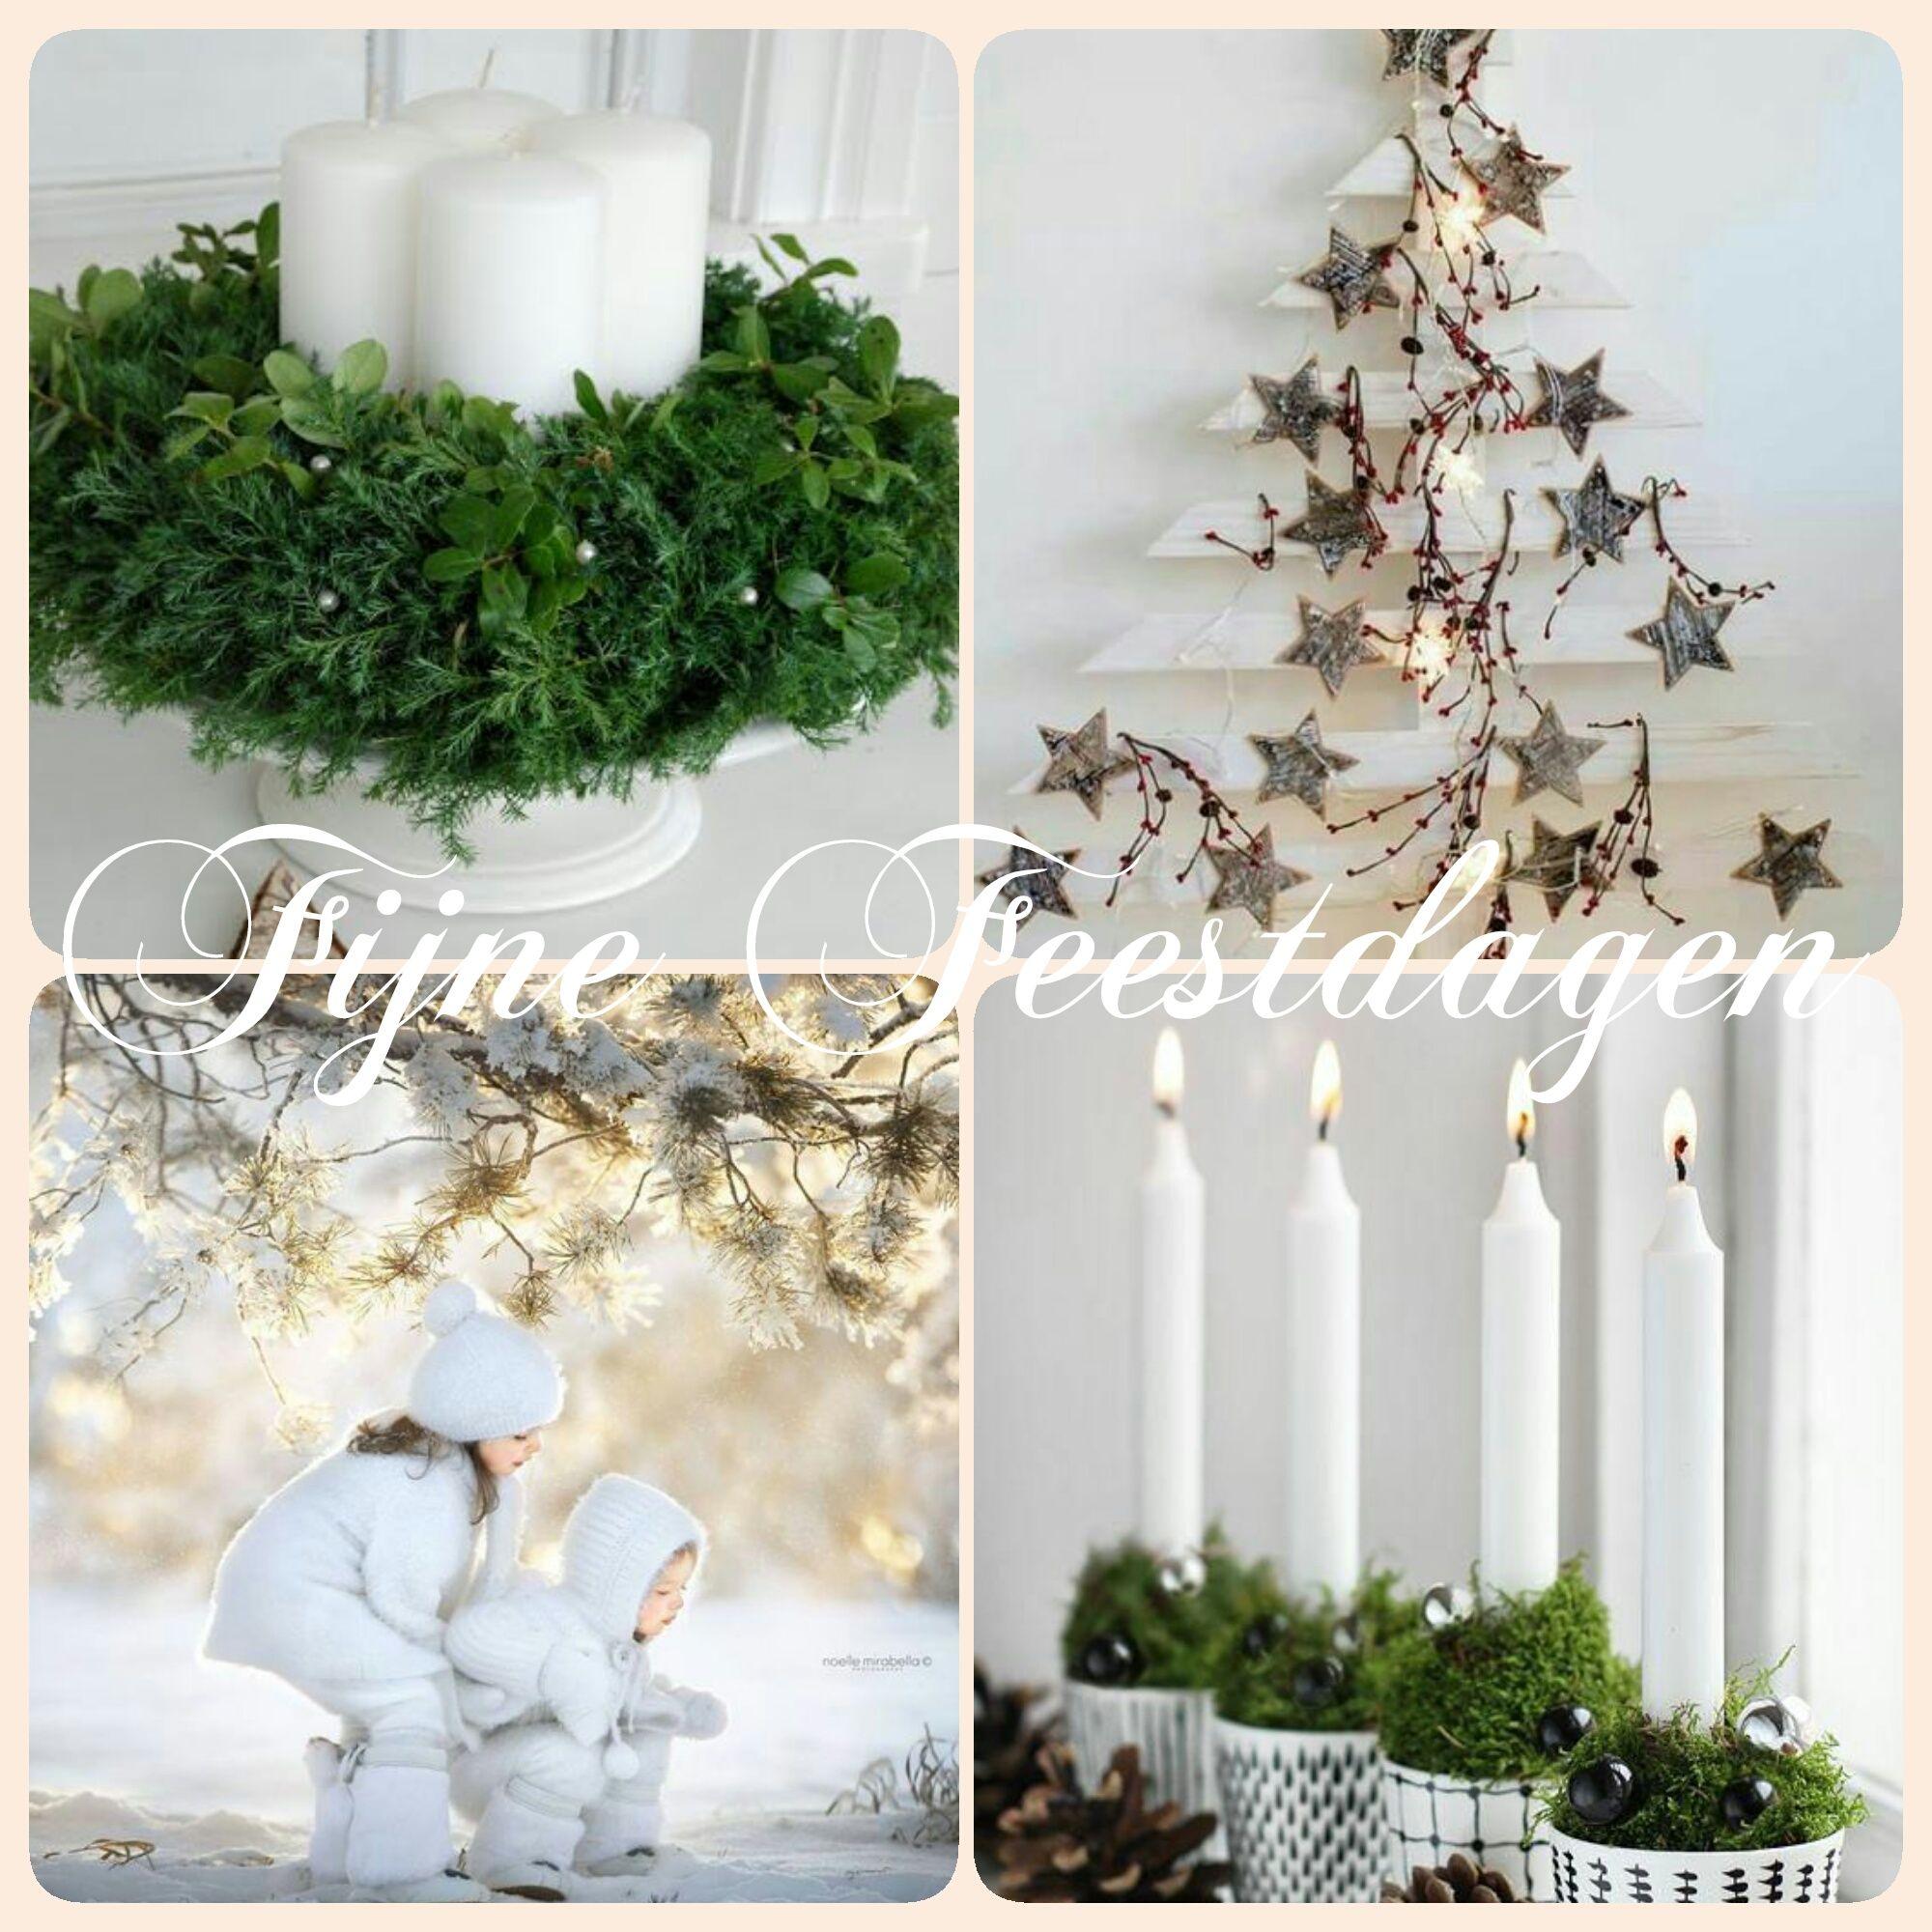 Merry Christmas everyone!!  🎄✨😇🙏🏼✨🎄